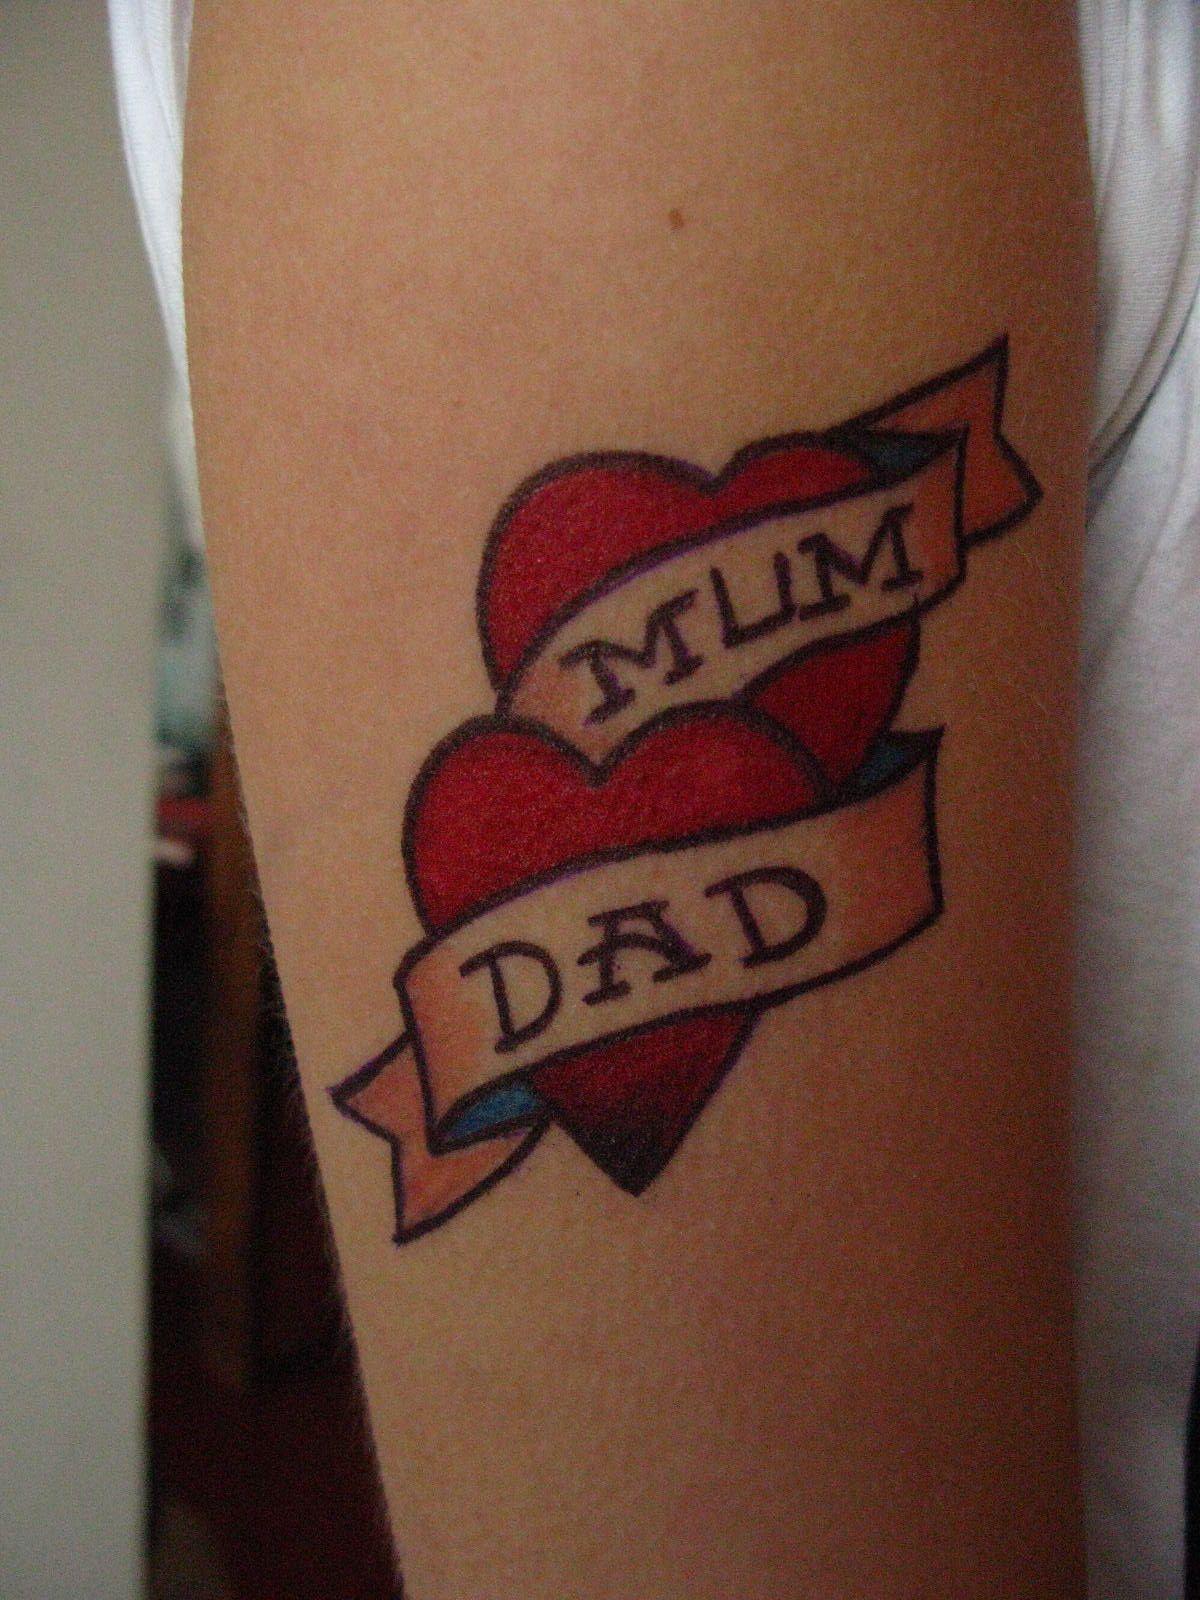 Henna Tattoo Vs Real Tattoo: Temporary Tattoos That Look Real Temp Tattoos For Remix